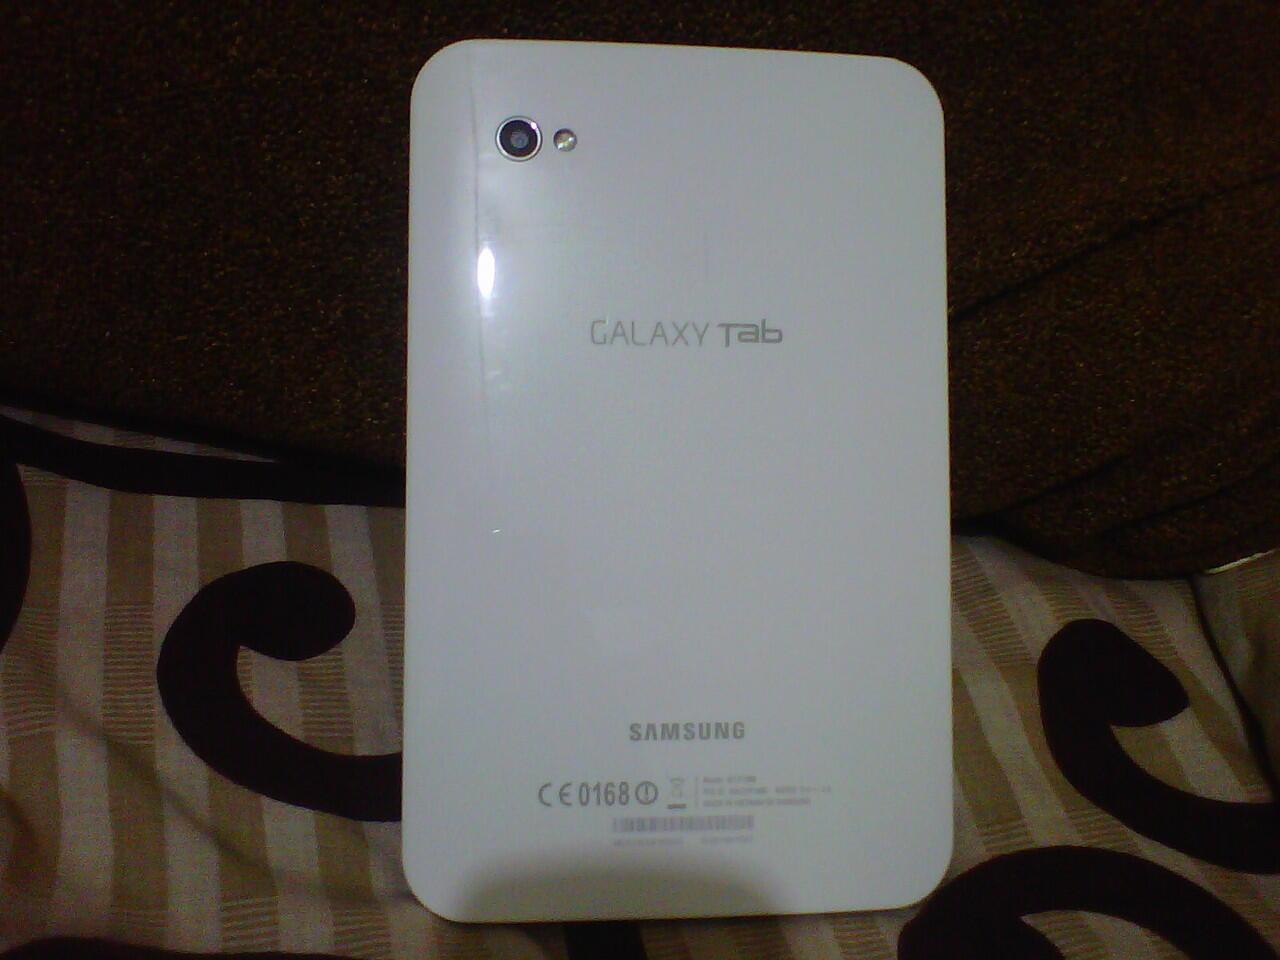 Galaxy Tab P1000 Yahuuudd